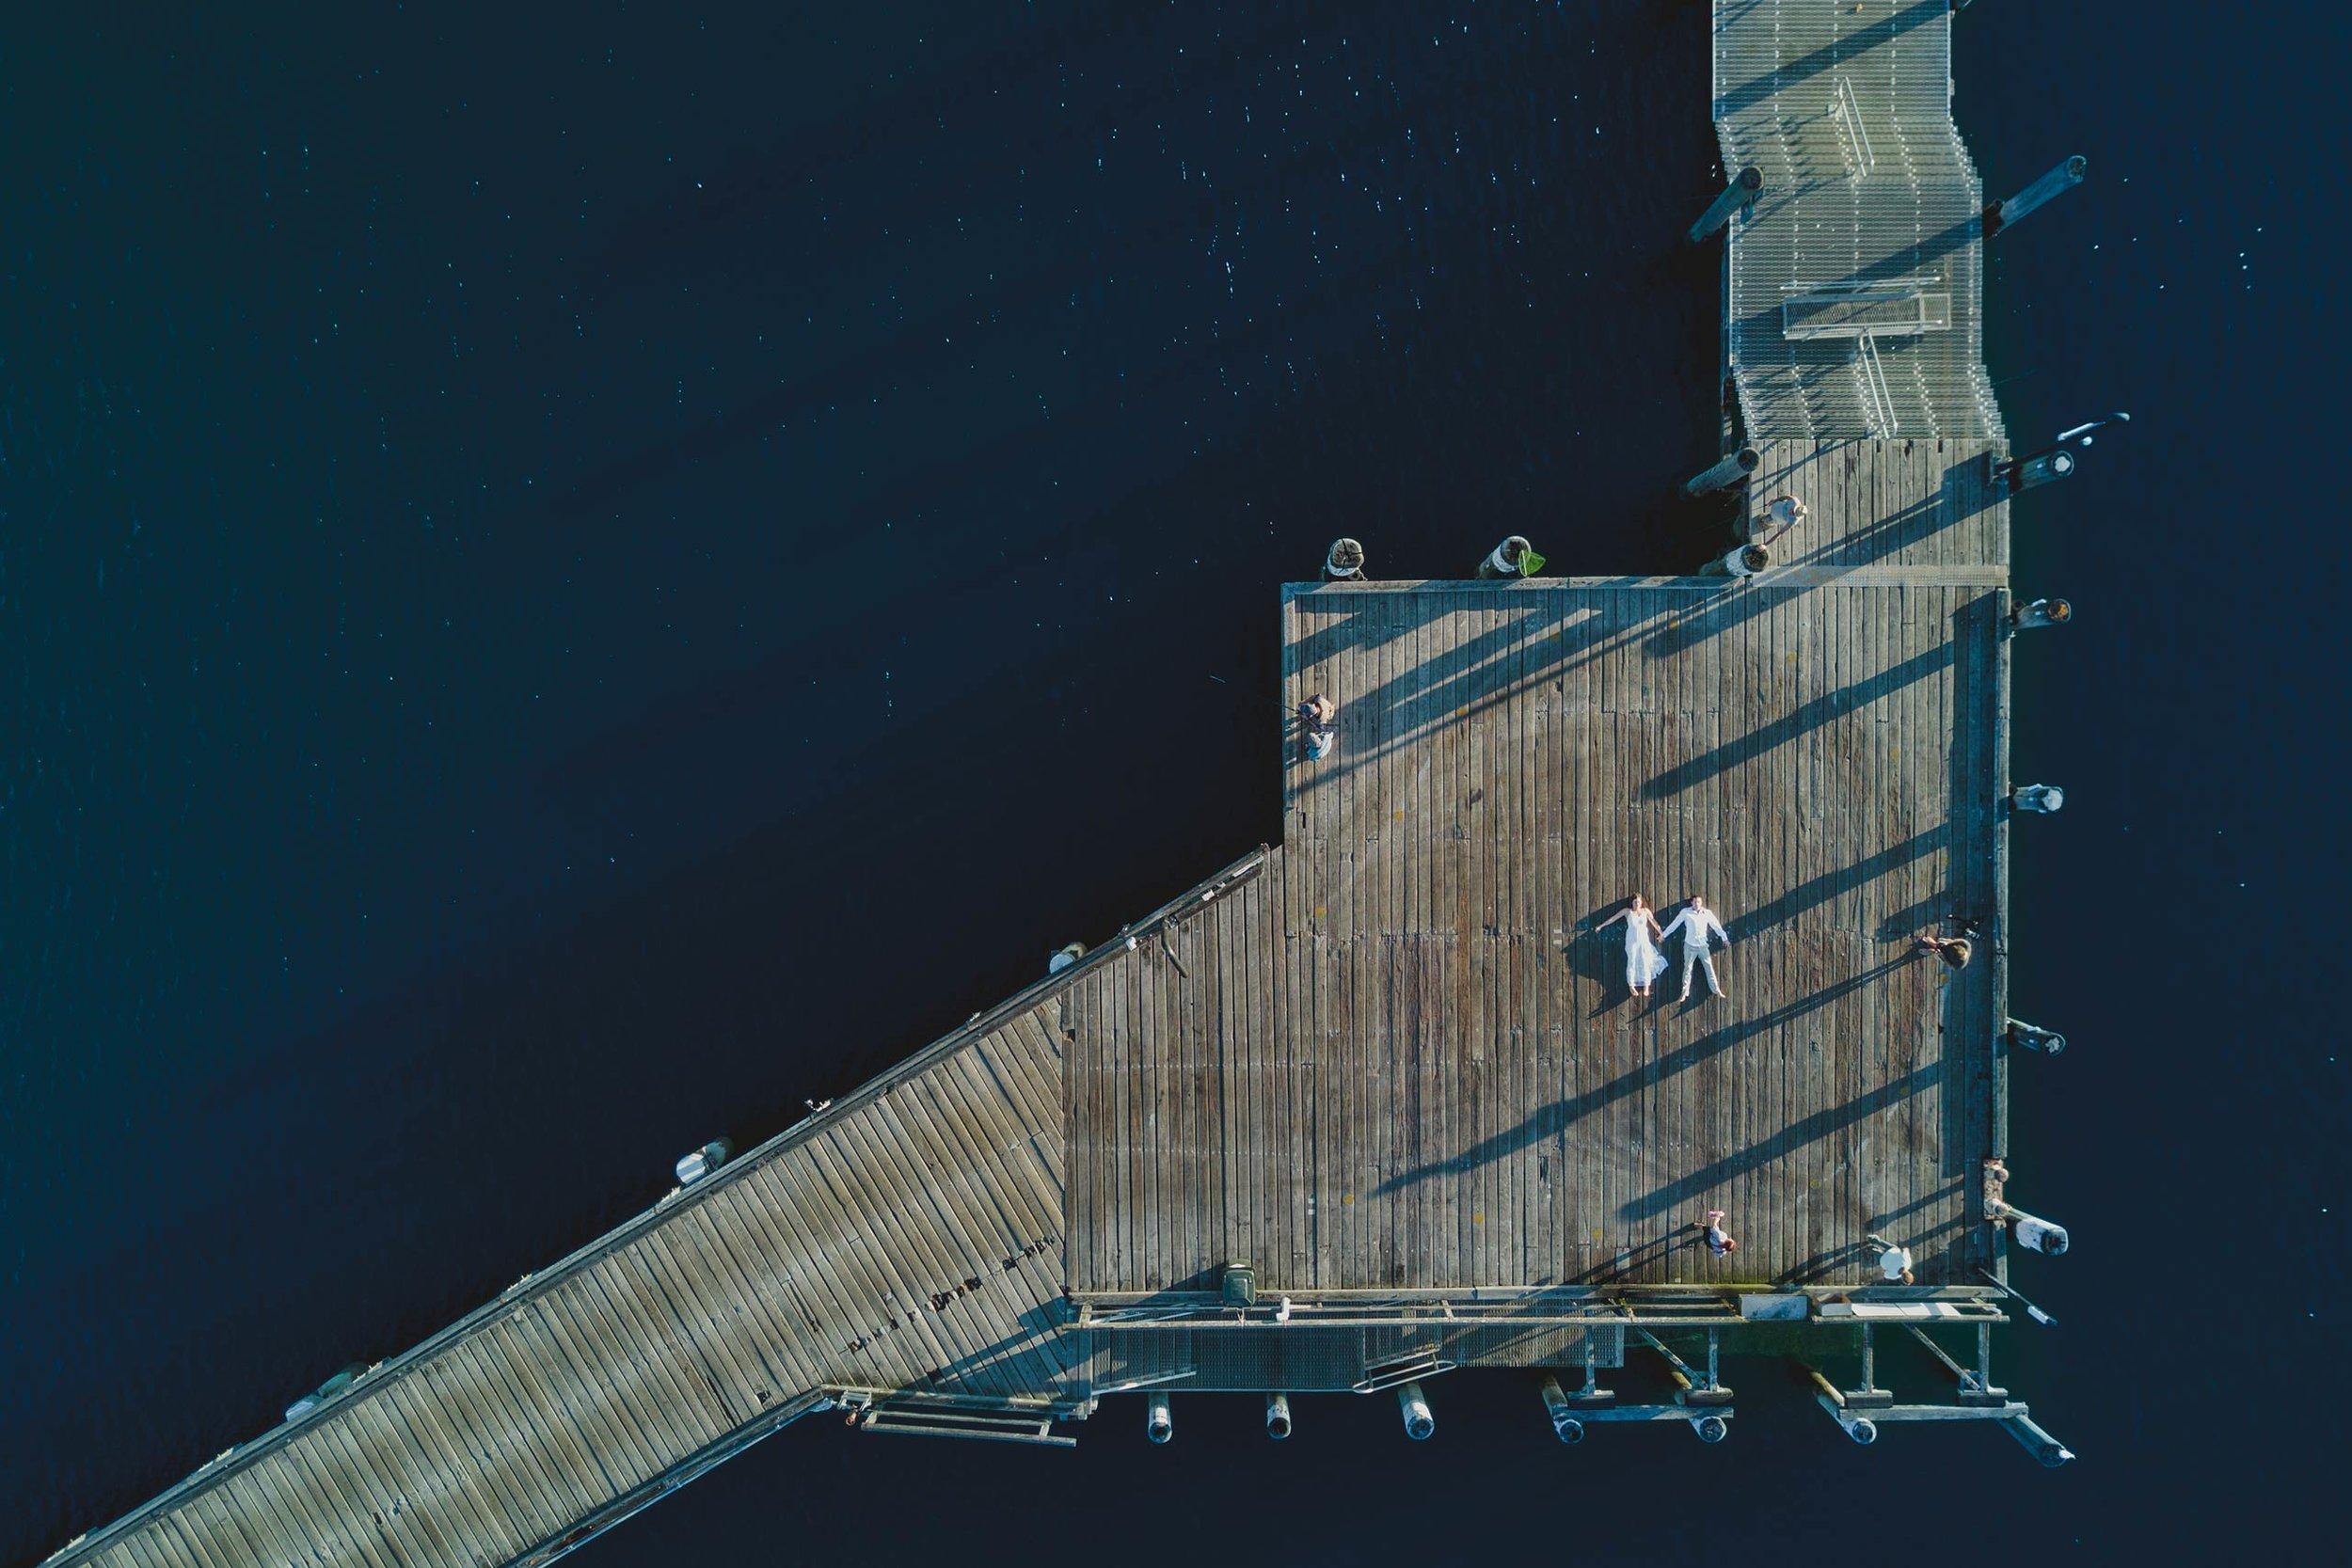 Top Noosa Drone Destination Wedding Photographer - Best Eco Sunshine Coast, Queensland, Australian